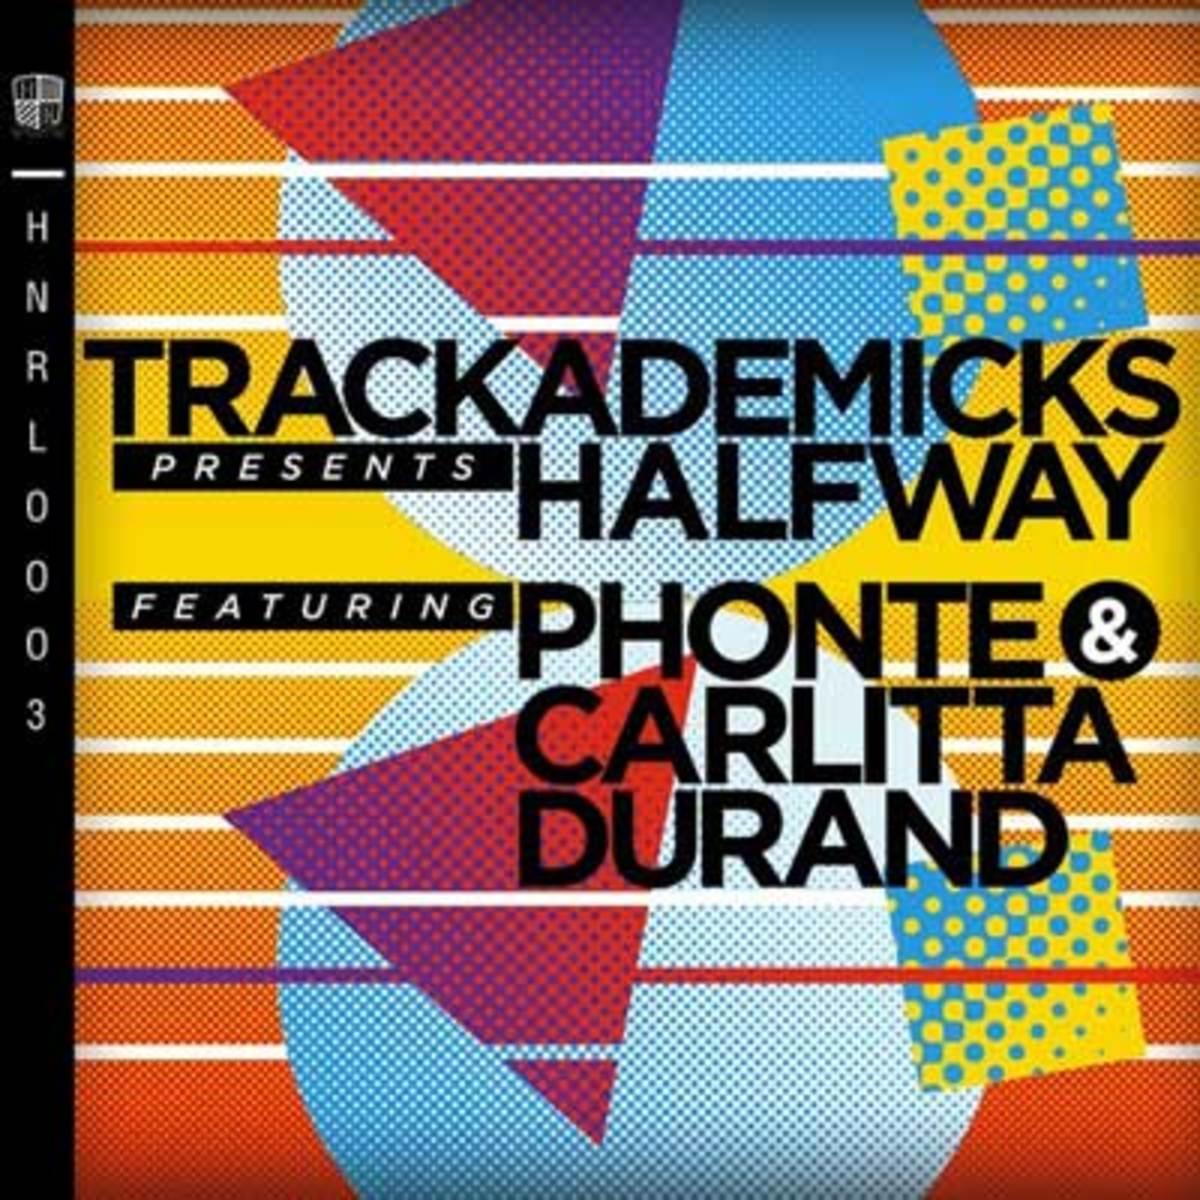 trackademicks-halfway.jpg